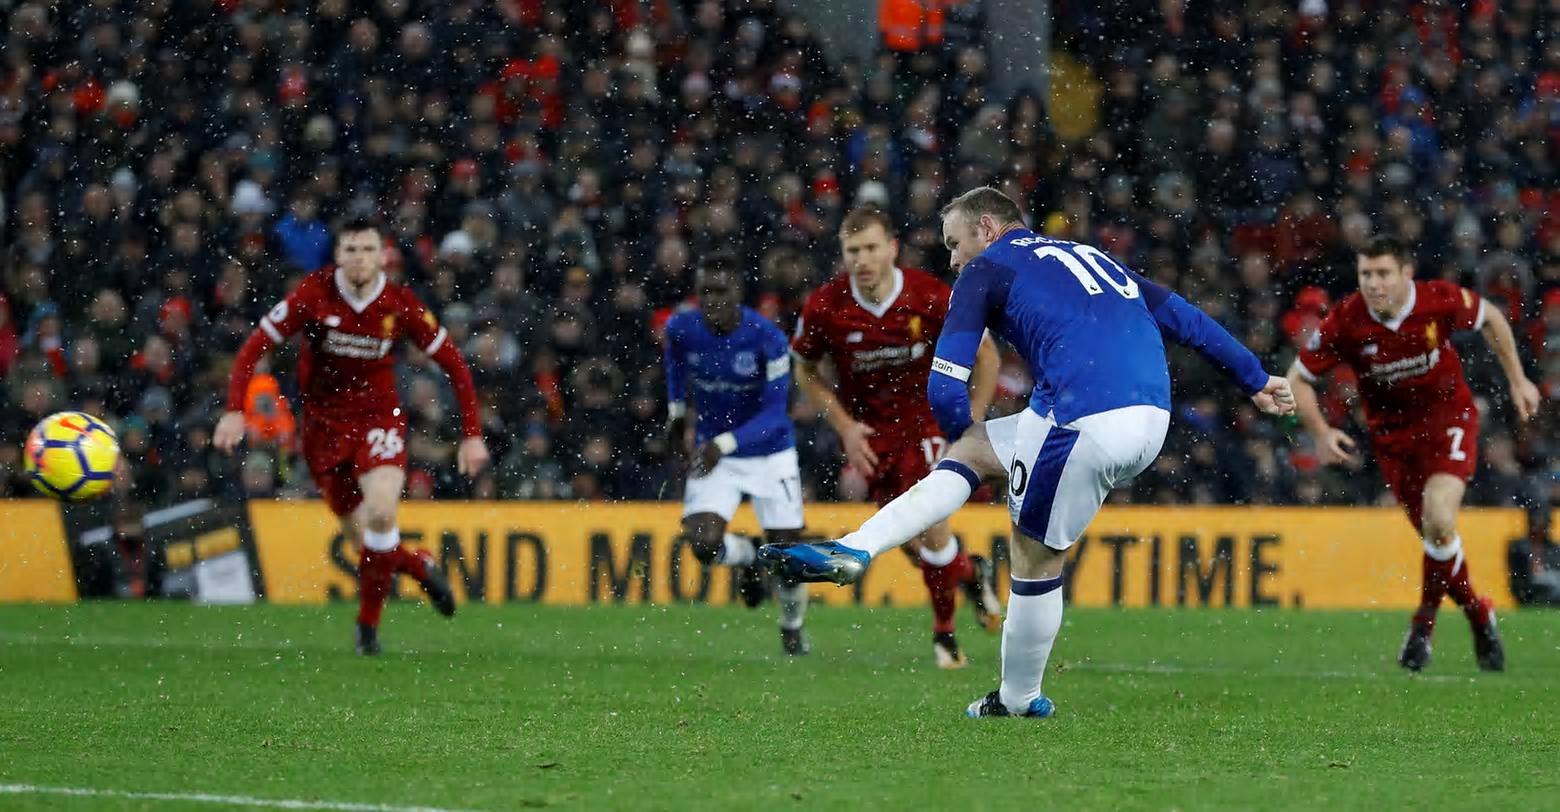 2659e78fd 10 December 2017 Rooney (Pen) v Liverpool (A) Wayne Rooney fires home